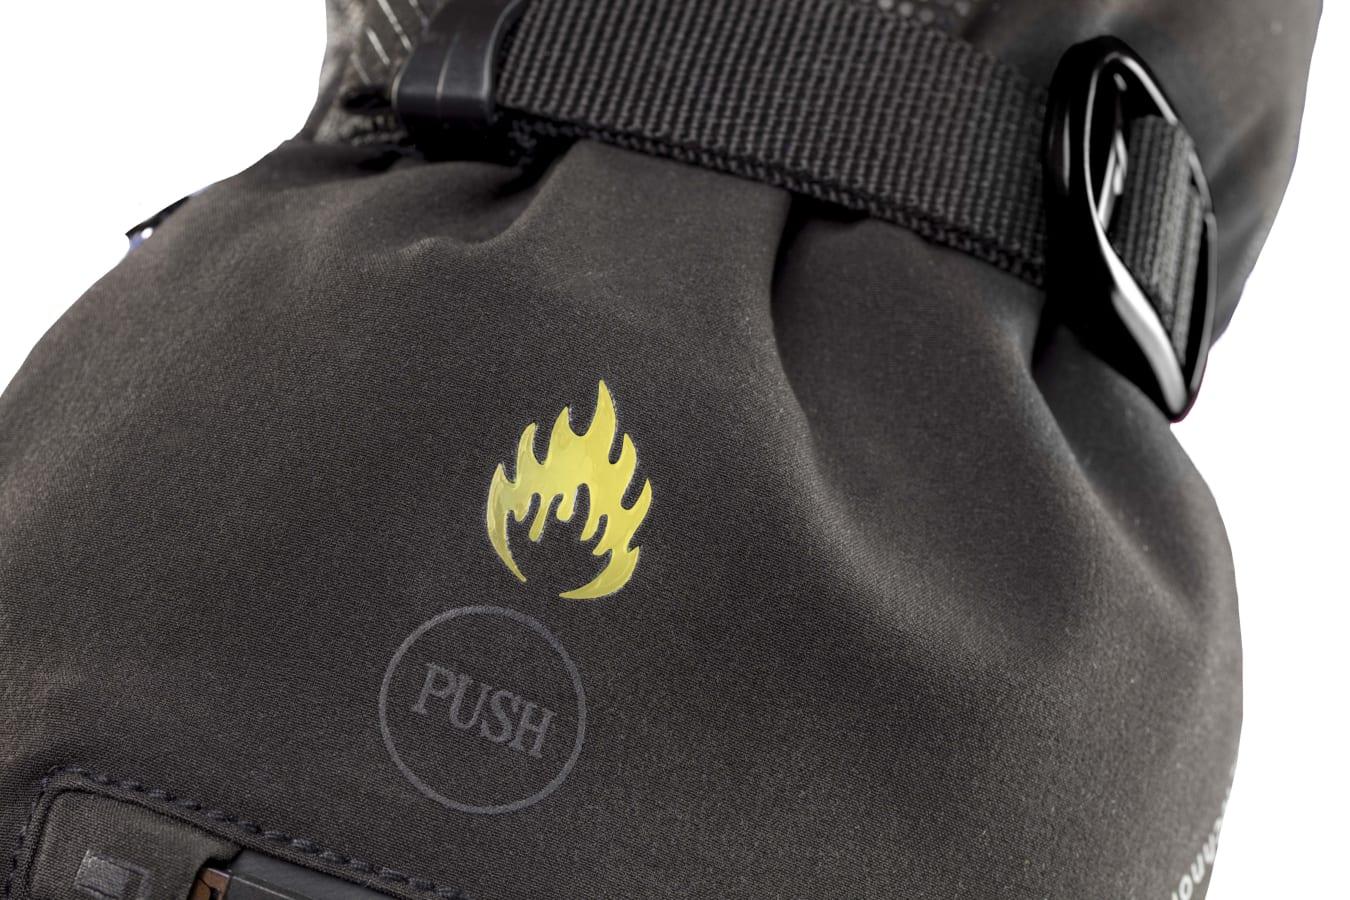 zanier_heat-stx_push.jpg